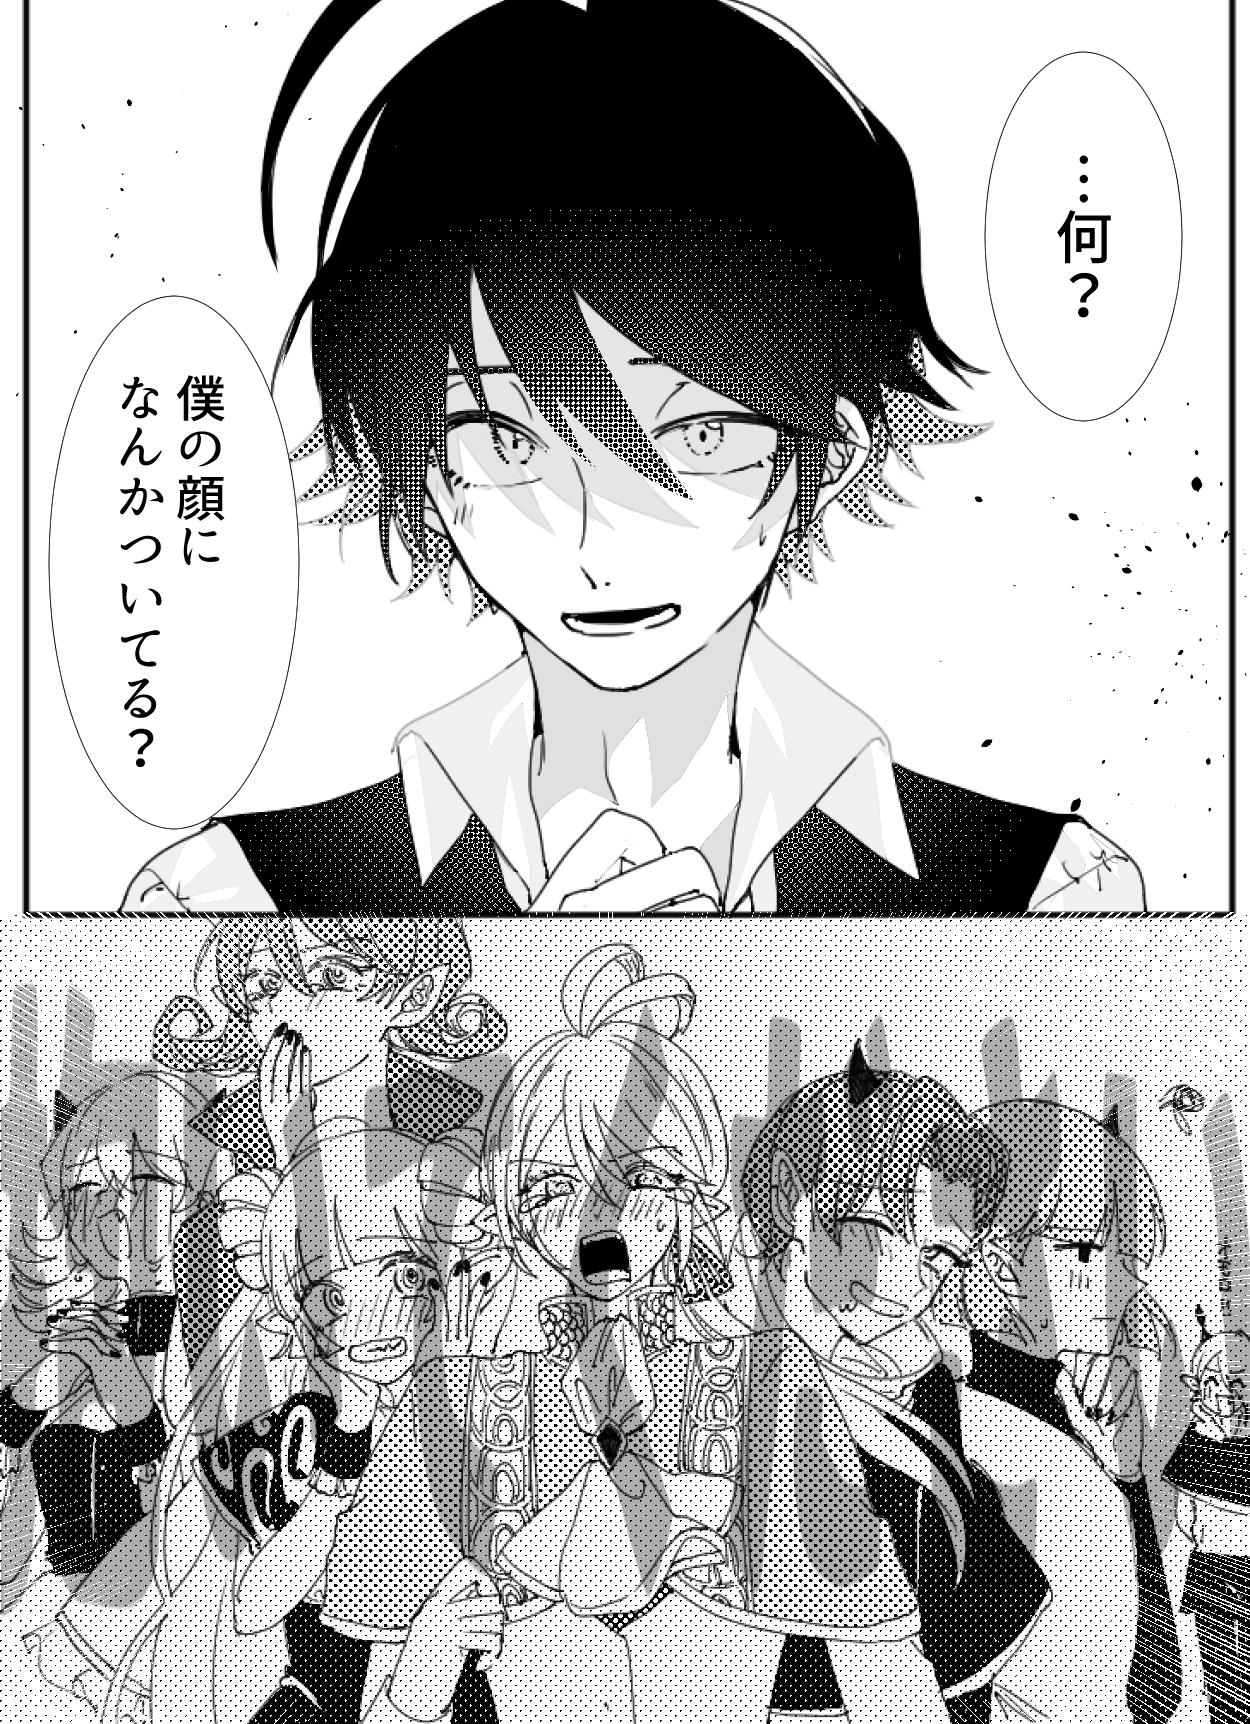 twitter アニメ少年 カワイイアニメ 漫画イラスト